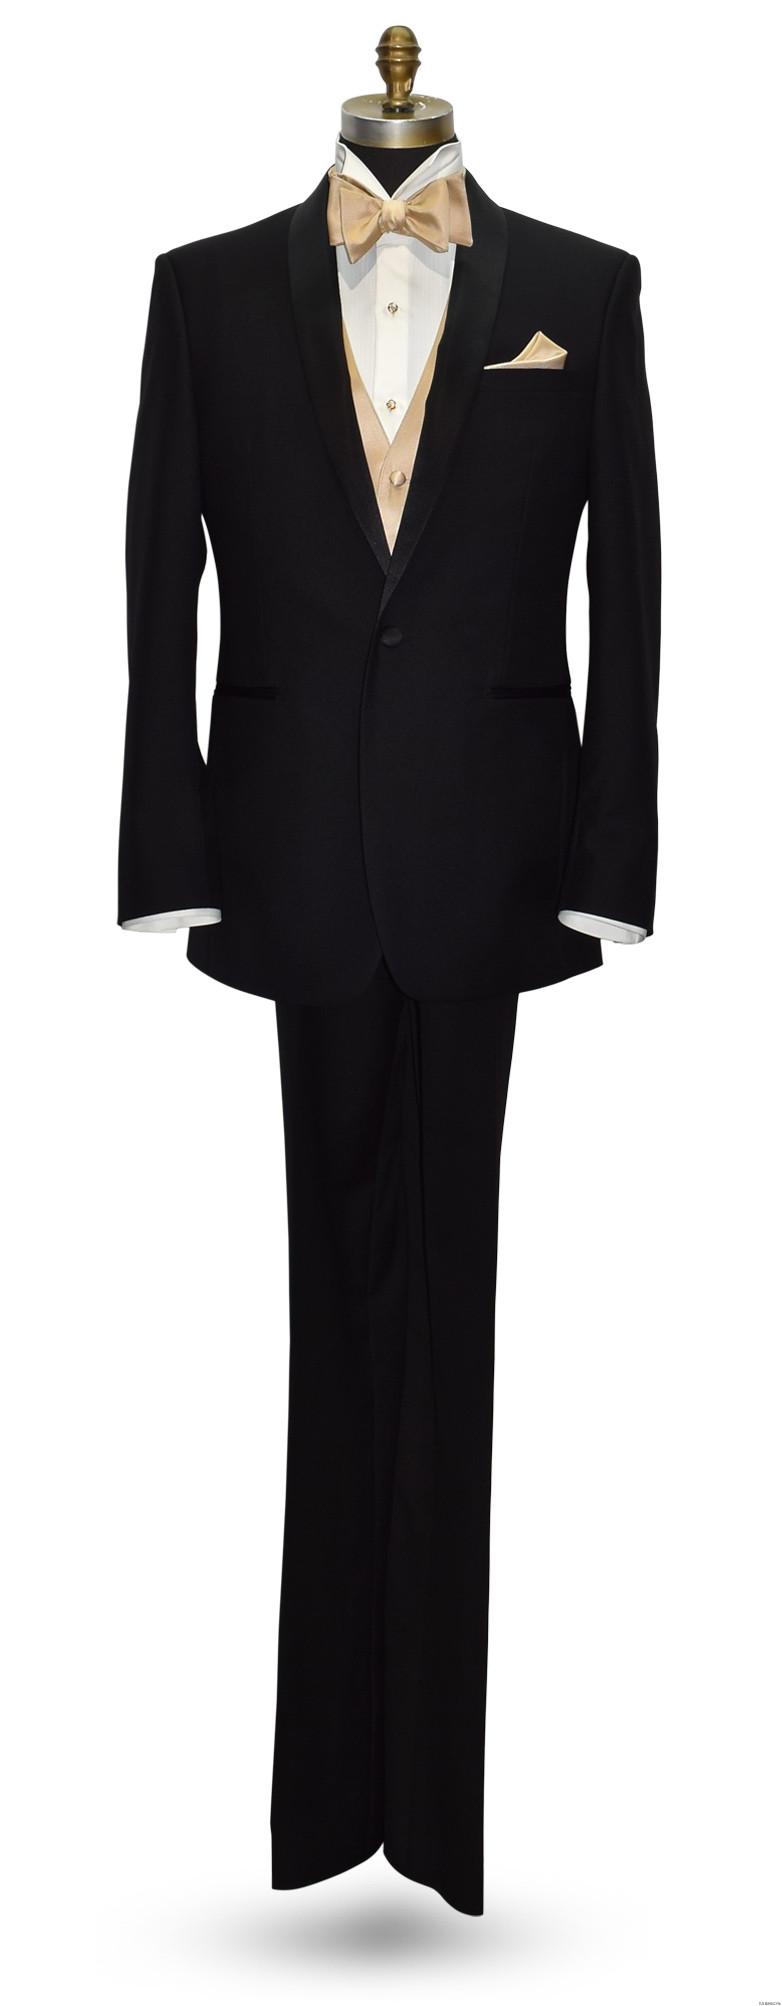 black tuxedo with golden vest and golden self-tie bowtie by San Miguel Formals